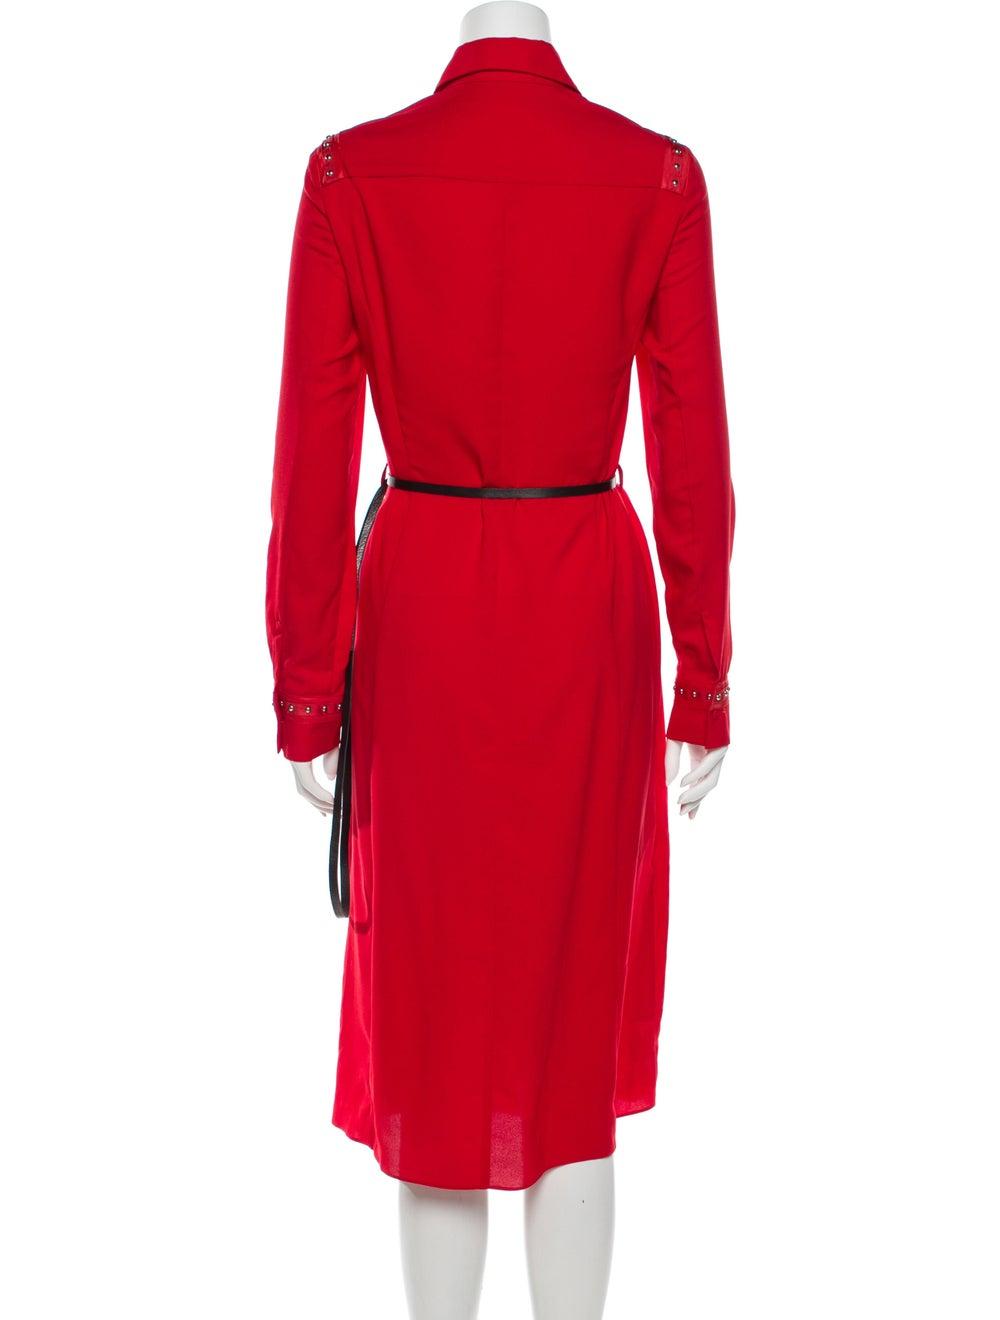 Altuzarra Midi Length Dress Red - image 3